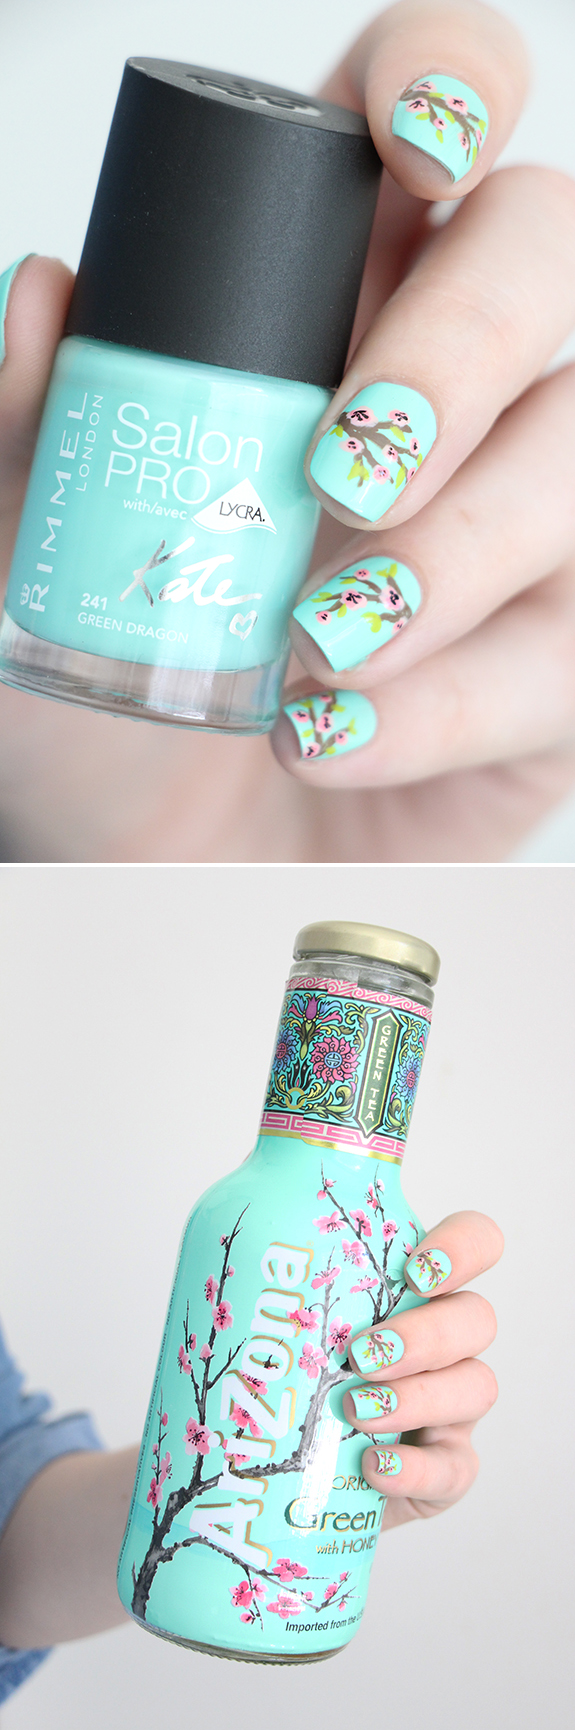 blossom-nails-4